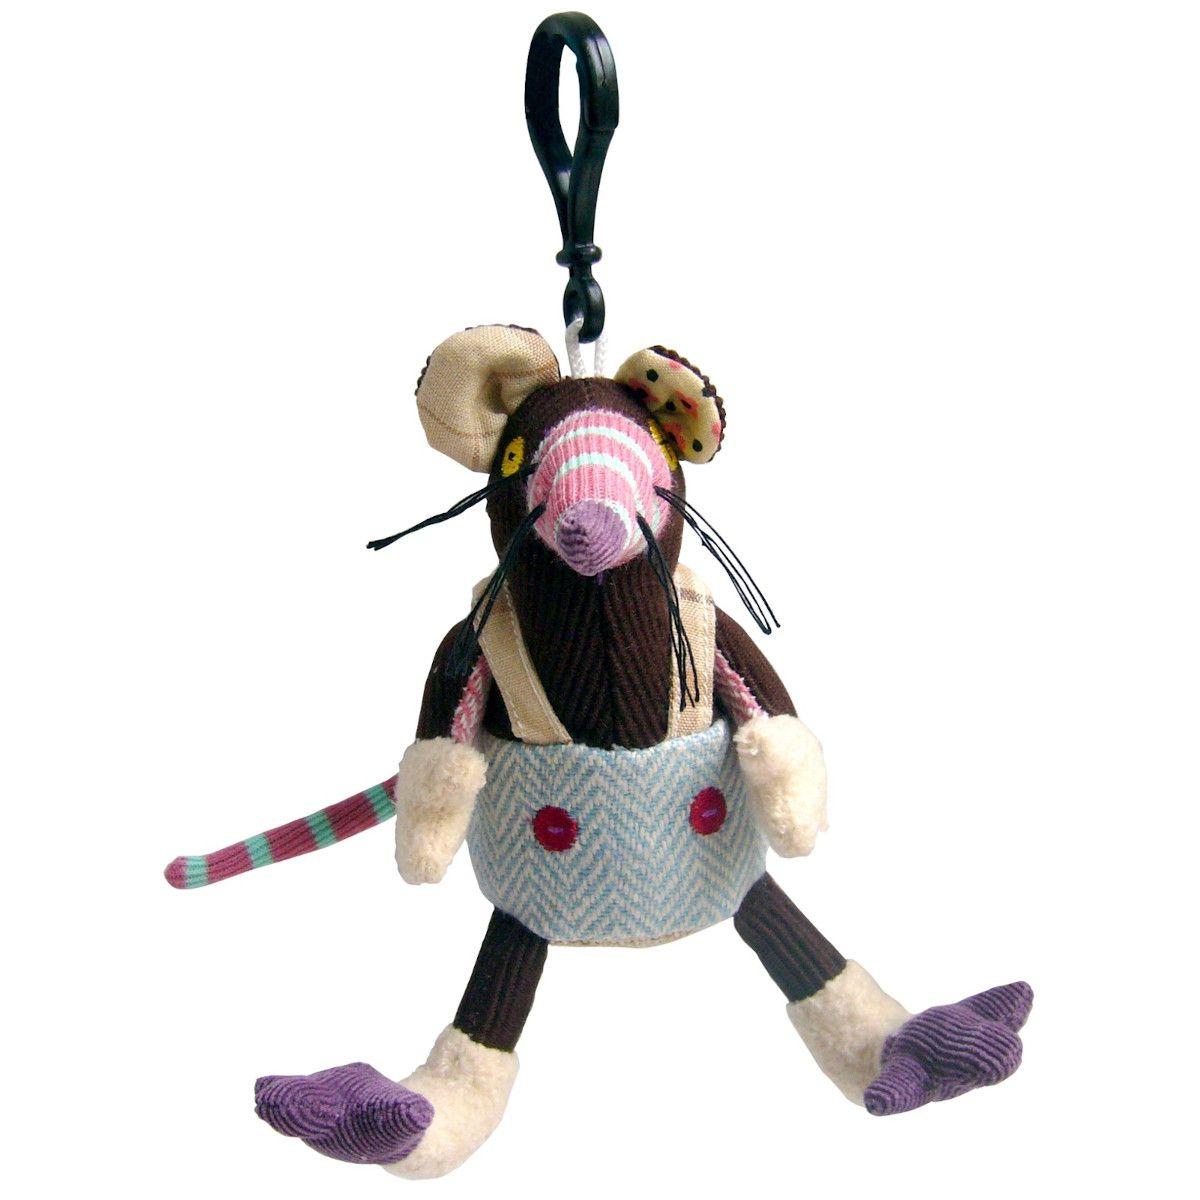 Chaveirinho Mini Ratos, o Rato Deglingos